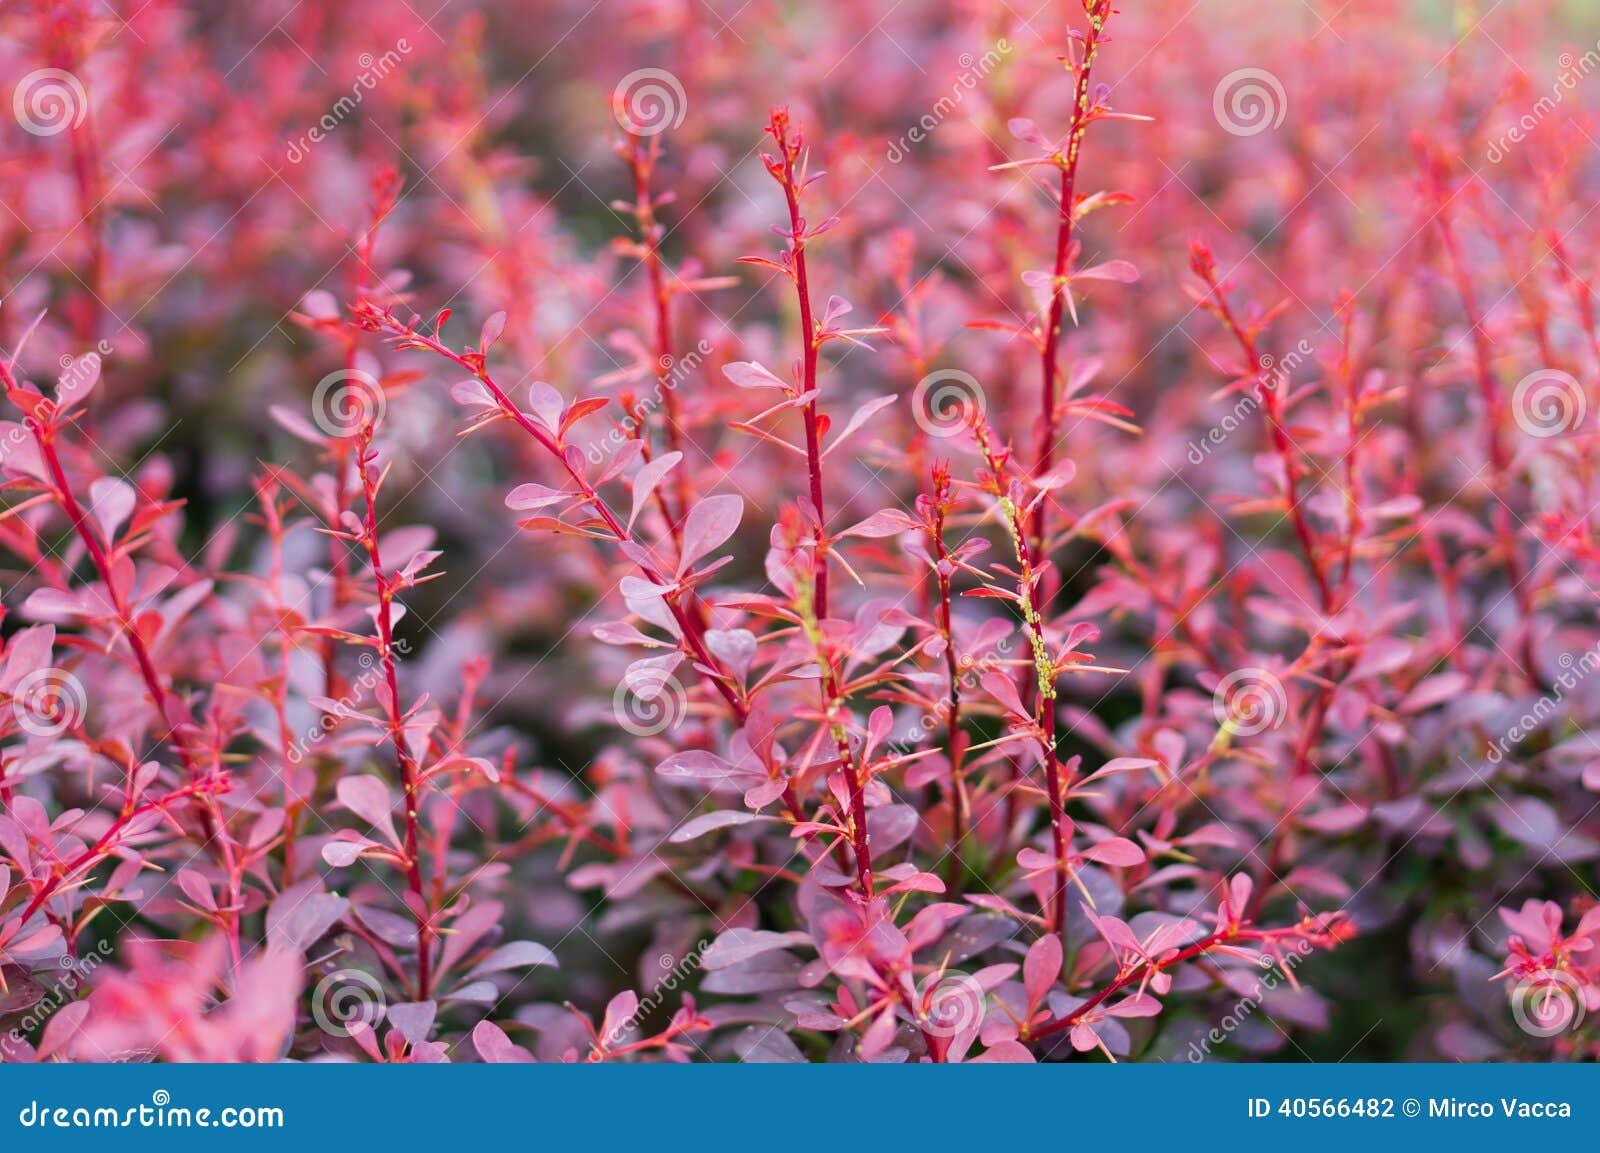 arbuste rouge photo stock image du arbre fond rouge 40566482. Black Bedroom Furniture Sets. Home Design Ideas